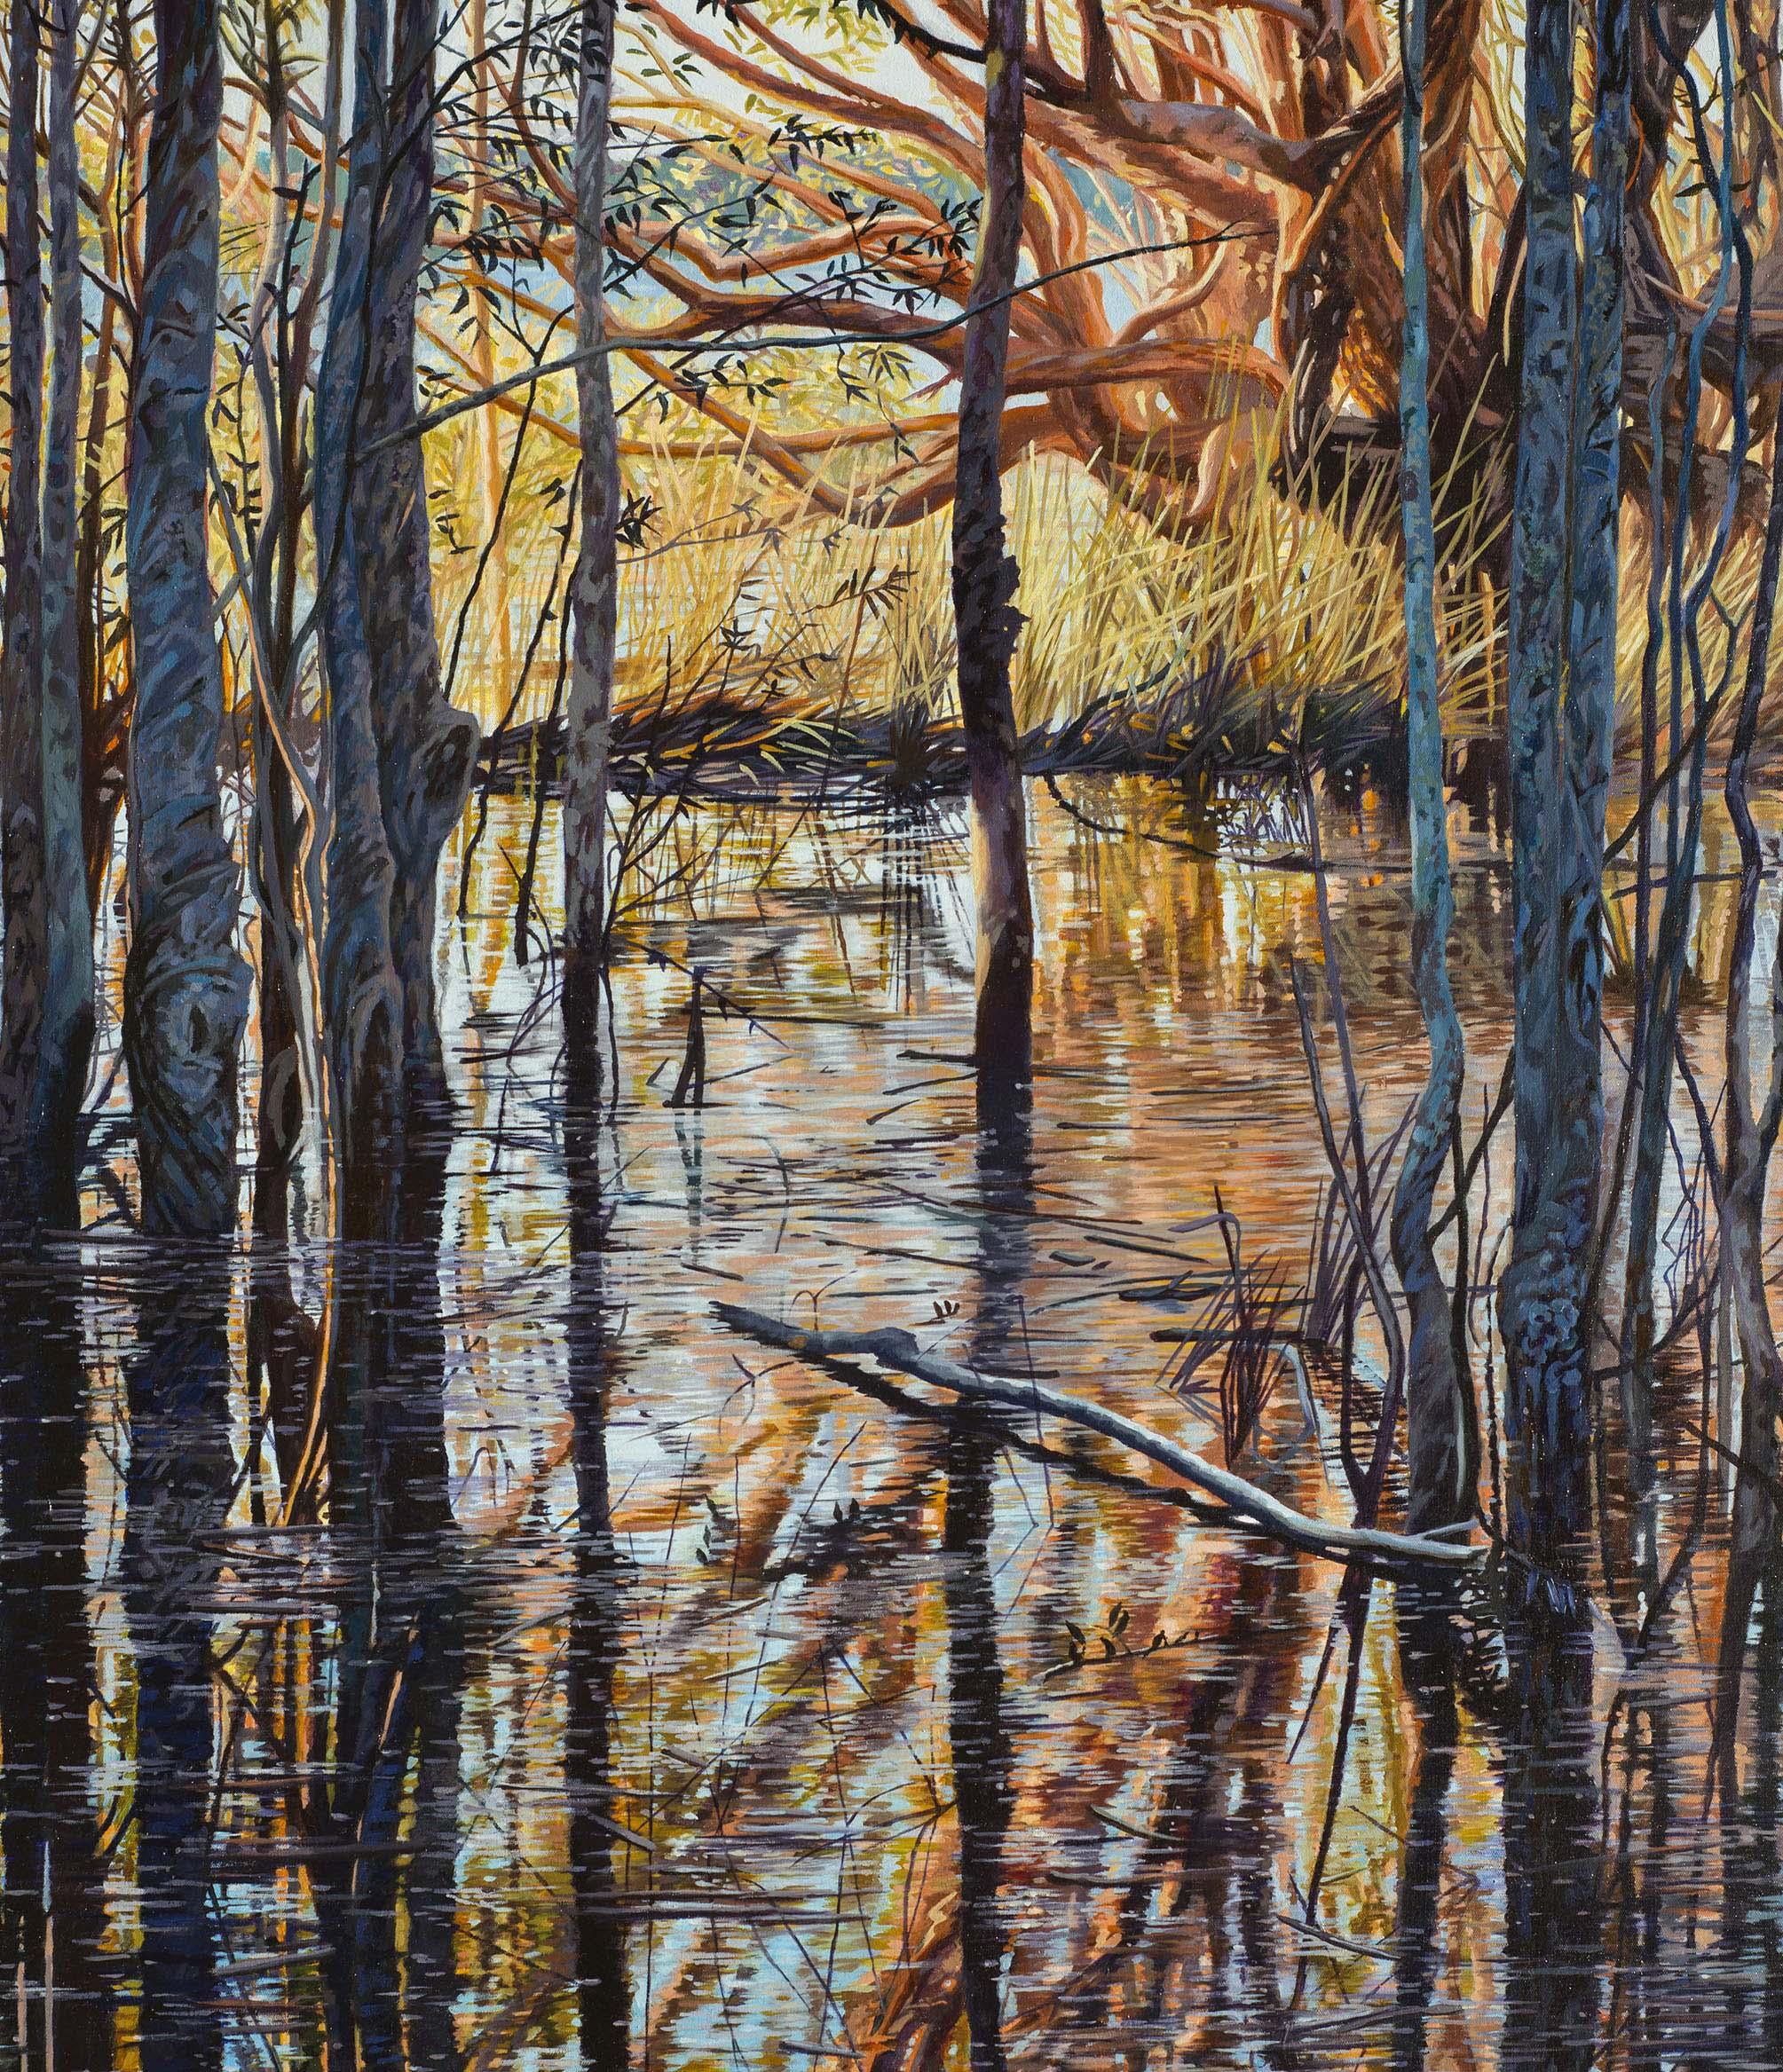 Jennifer Porter, Receding flood 2017, oil on canvas, 81x54cm